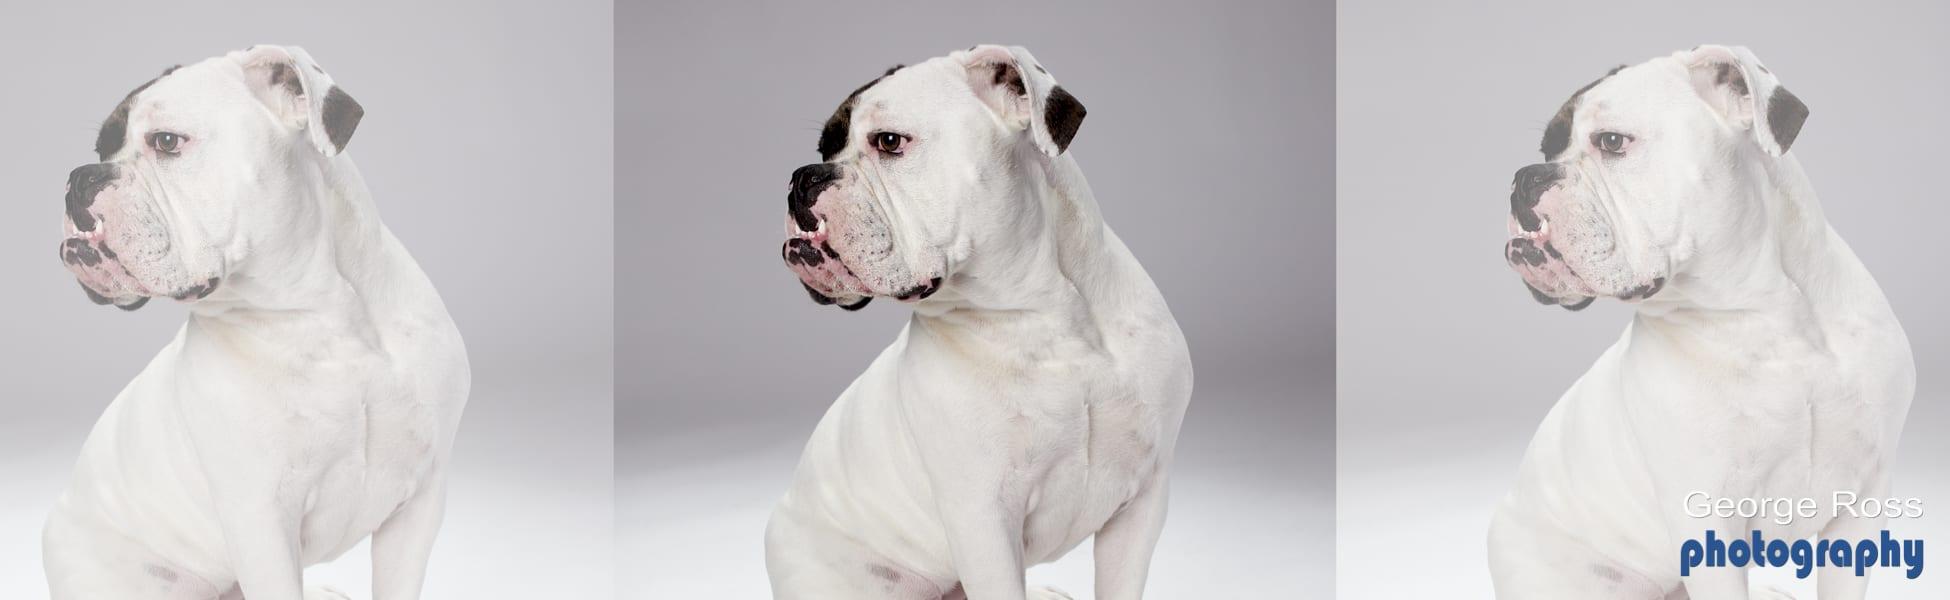 RiI Dog Photography